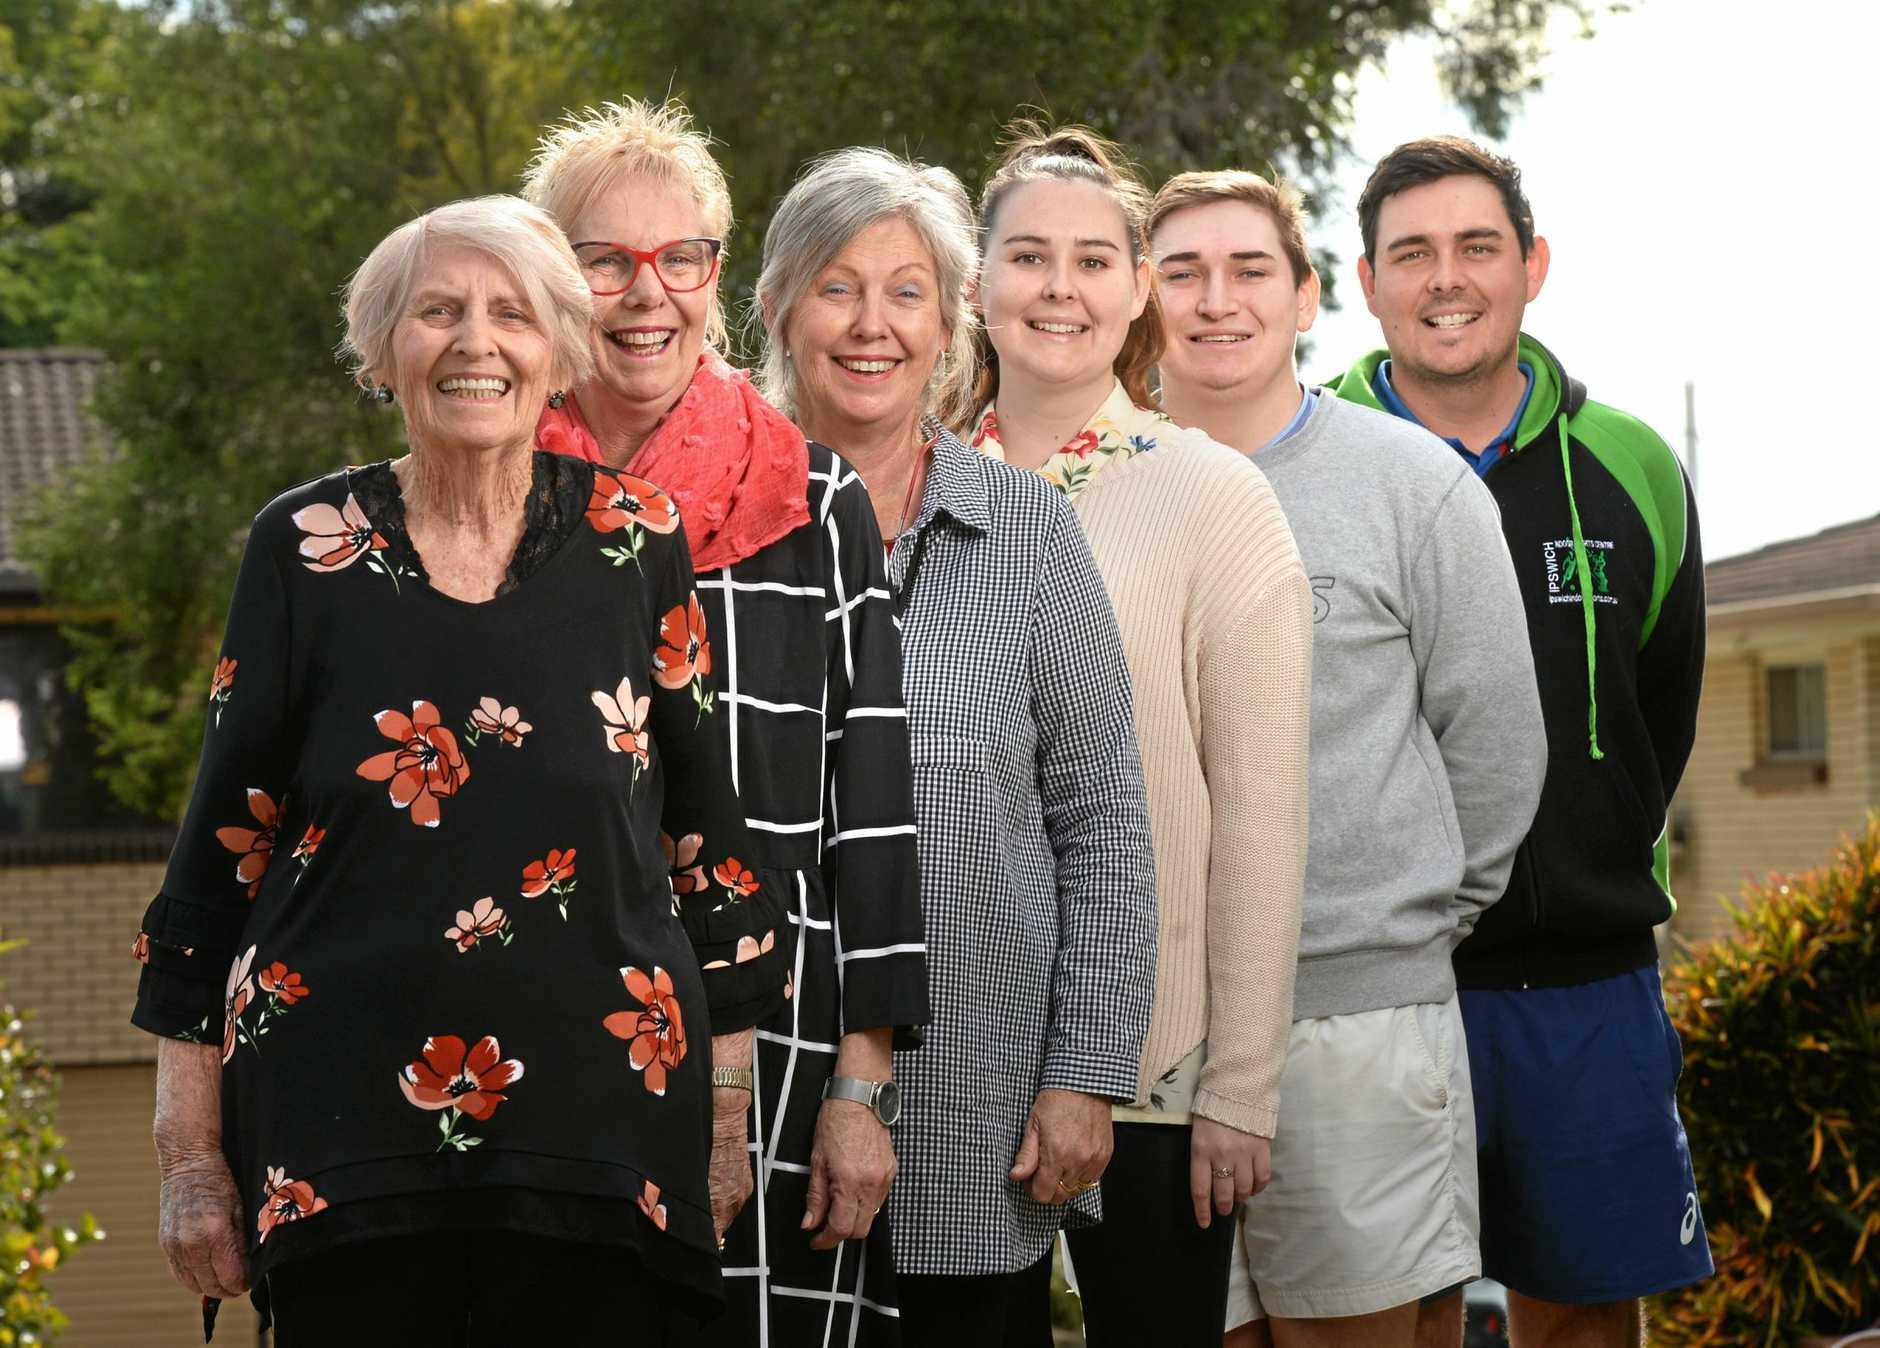 Three generations are in the Ipswich Orpheus Chorale . Bette Howard, Jesicca O'Sullivan, Debra Howard, Tyne O'Sullivan, Kye O'Sullivan and Rhys O'Sullivan.